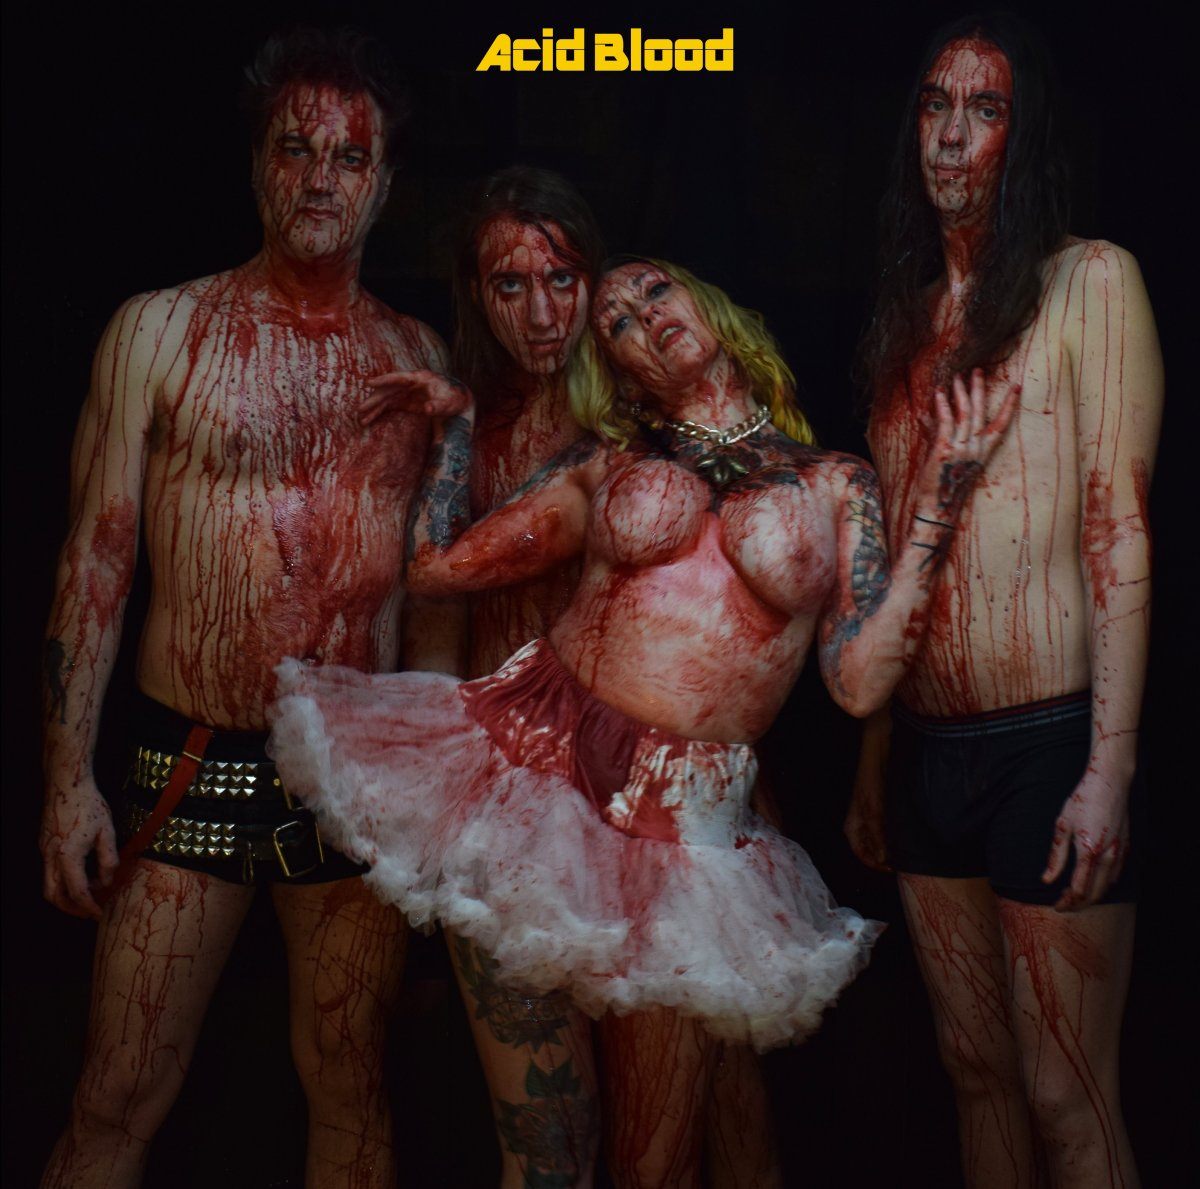 Acid Blood: Nuevo single y videoclip «To The Grape»